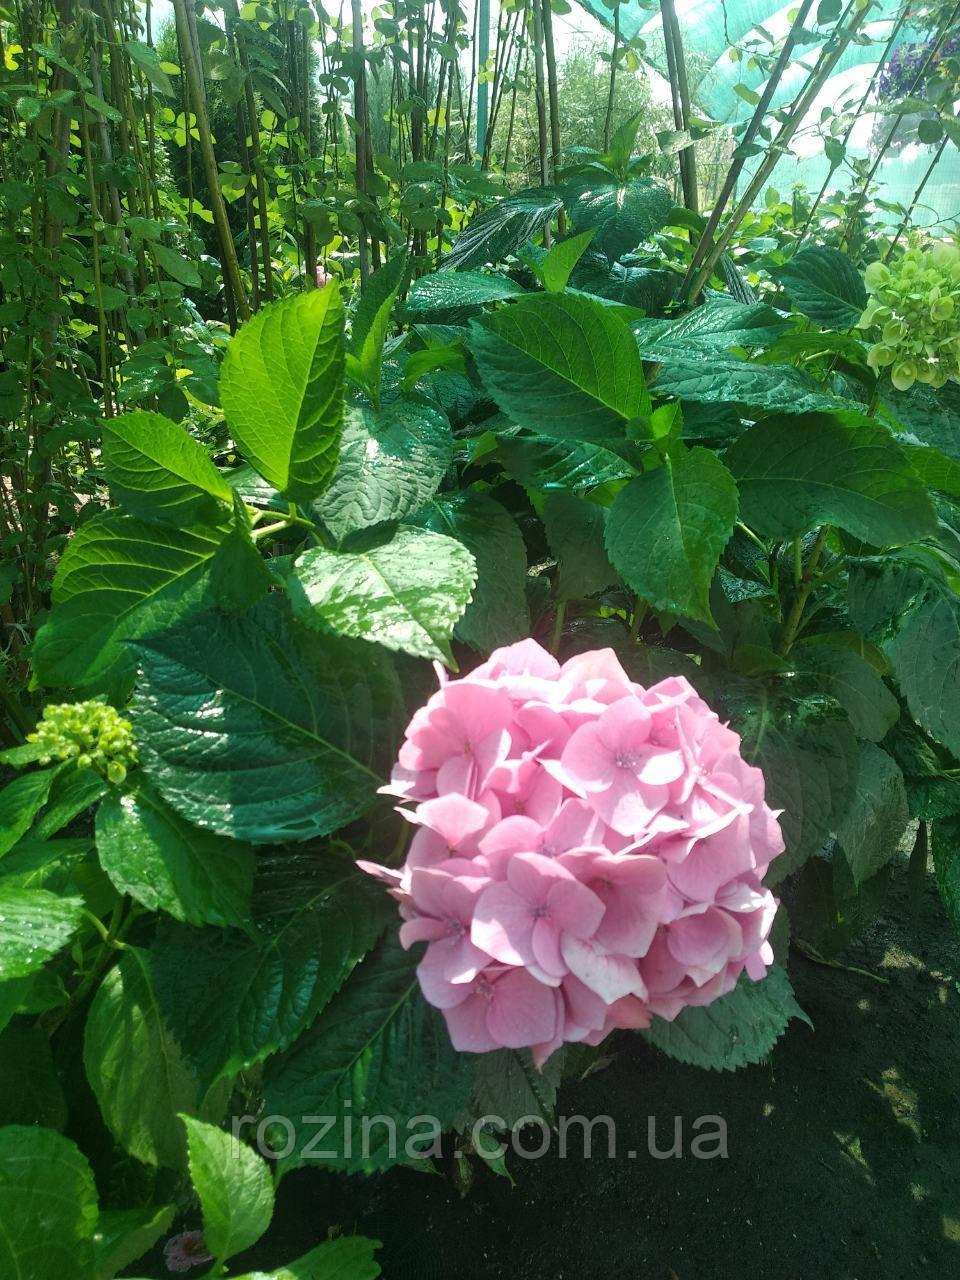 Гортензия крупнолистая Букет роуз